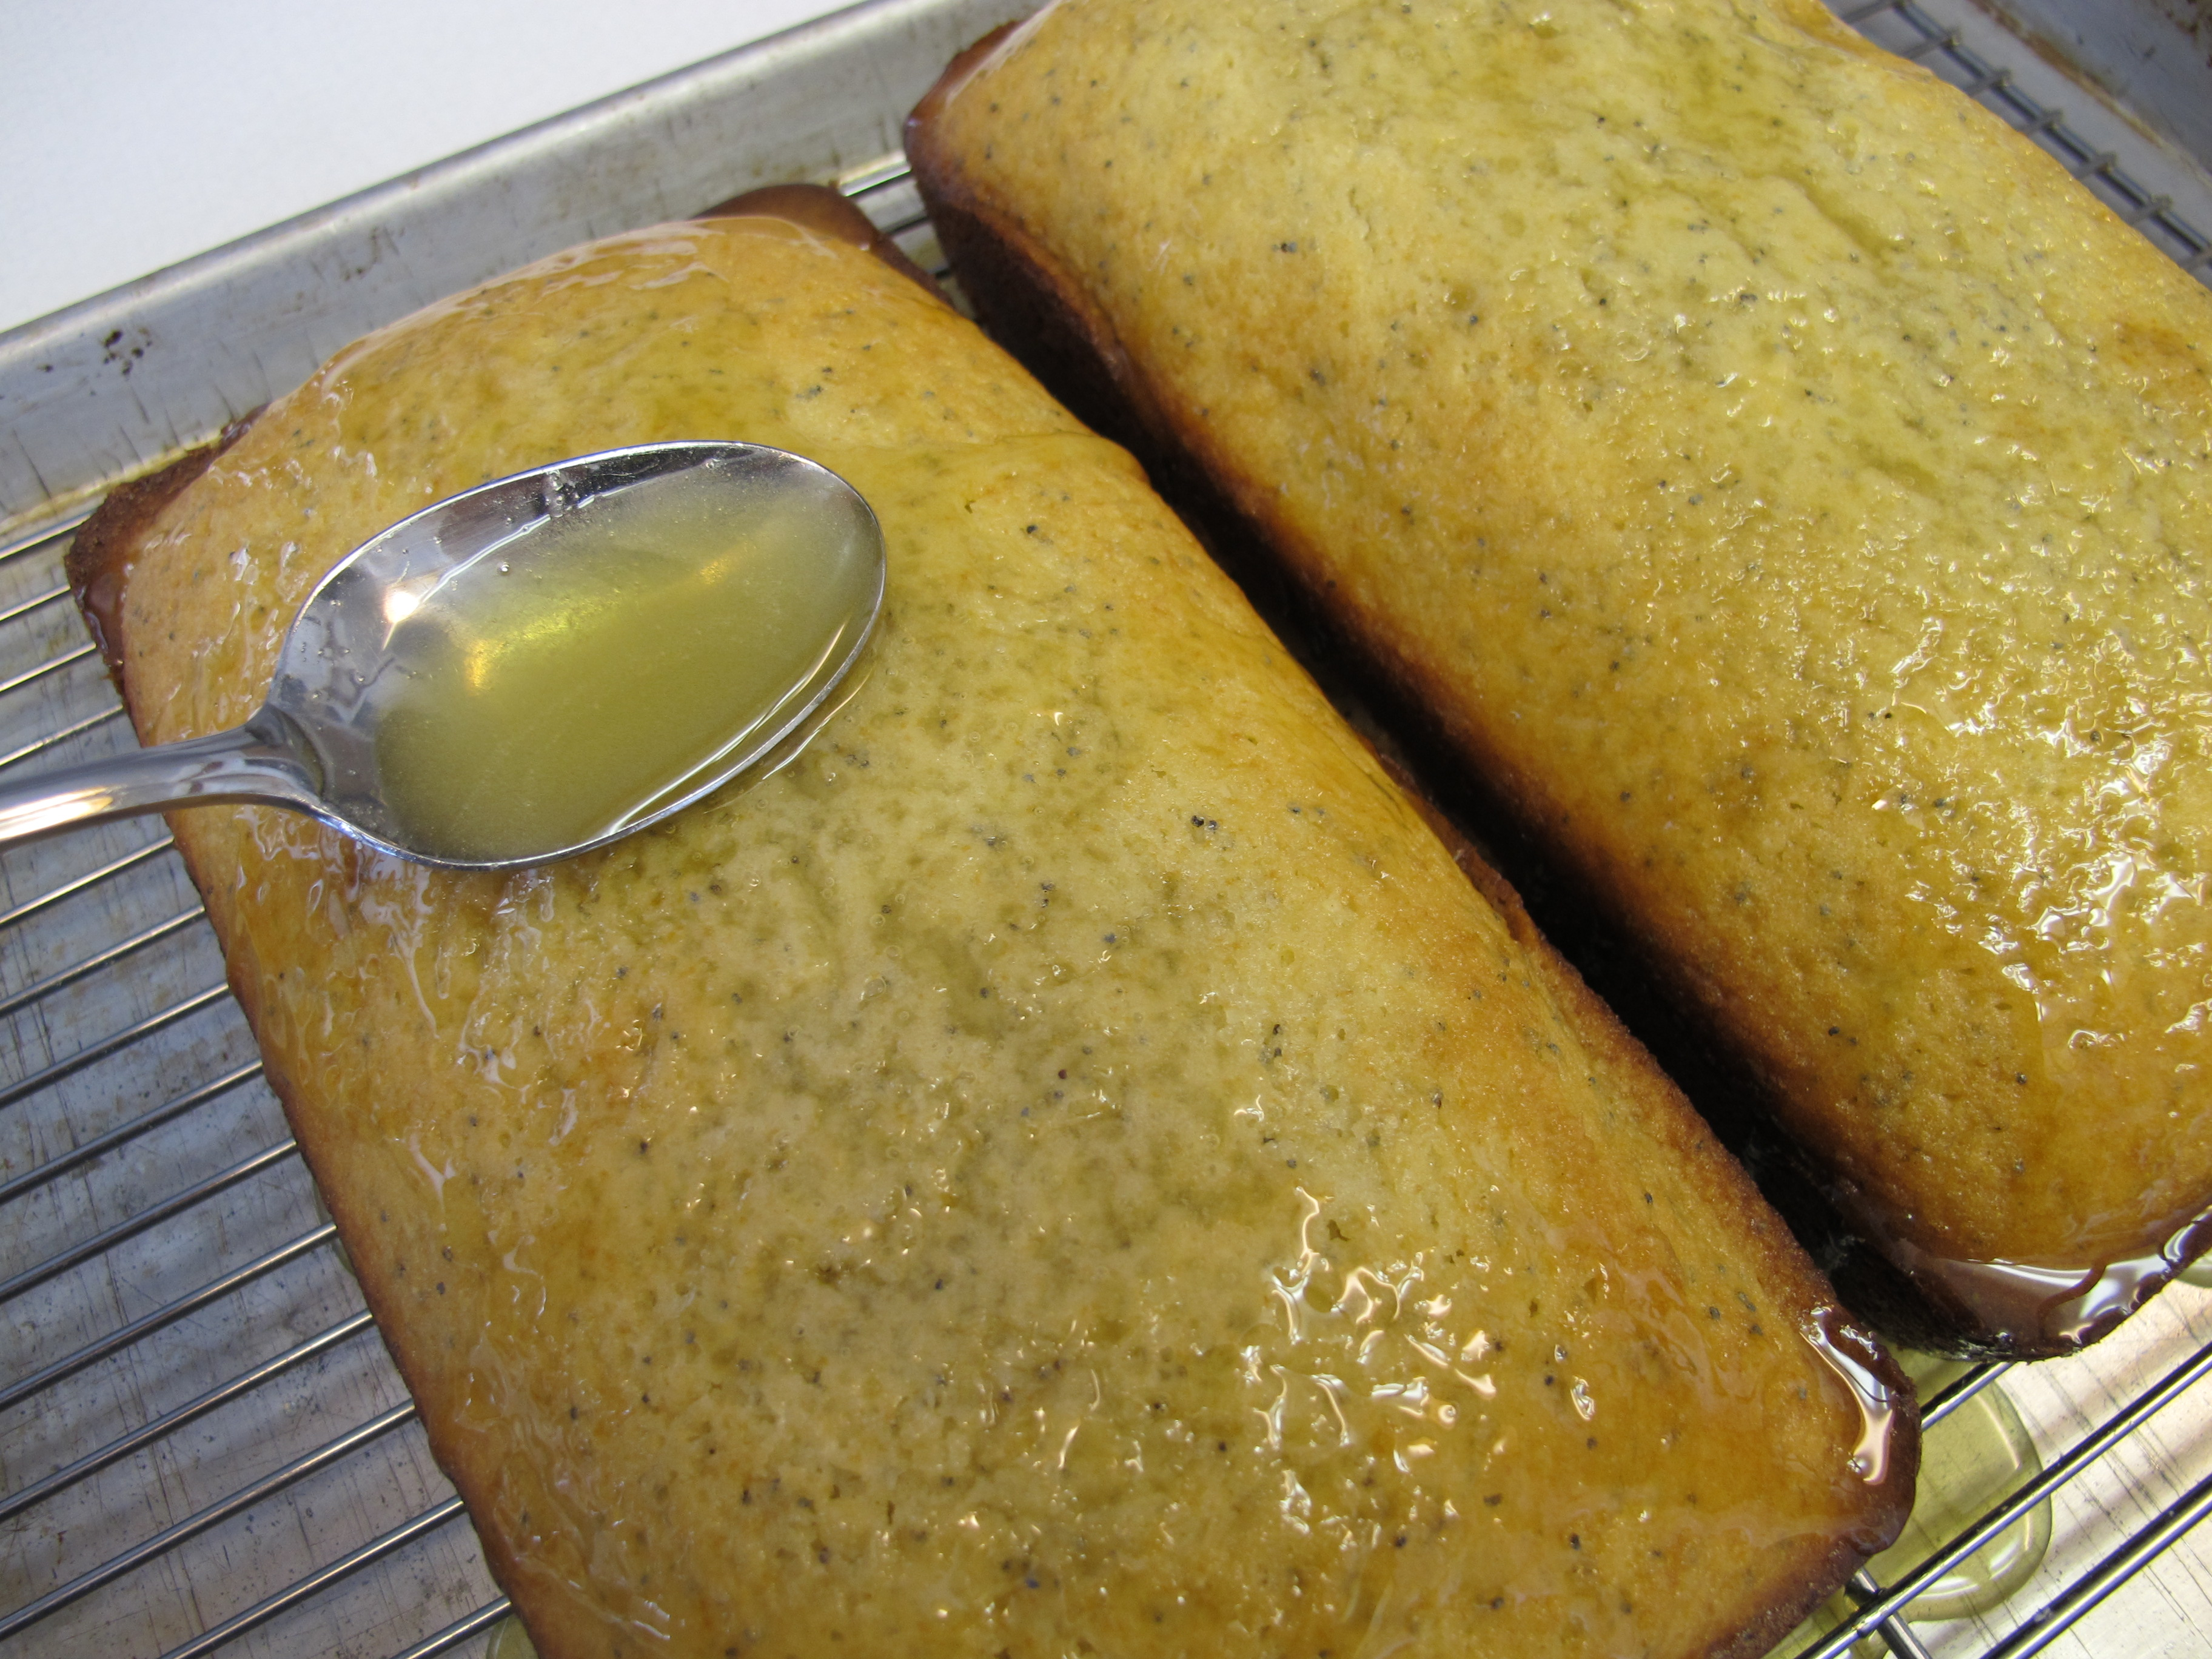 Poppyseed Bread with Orange Glaze | No Meals on Wheels